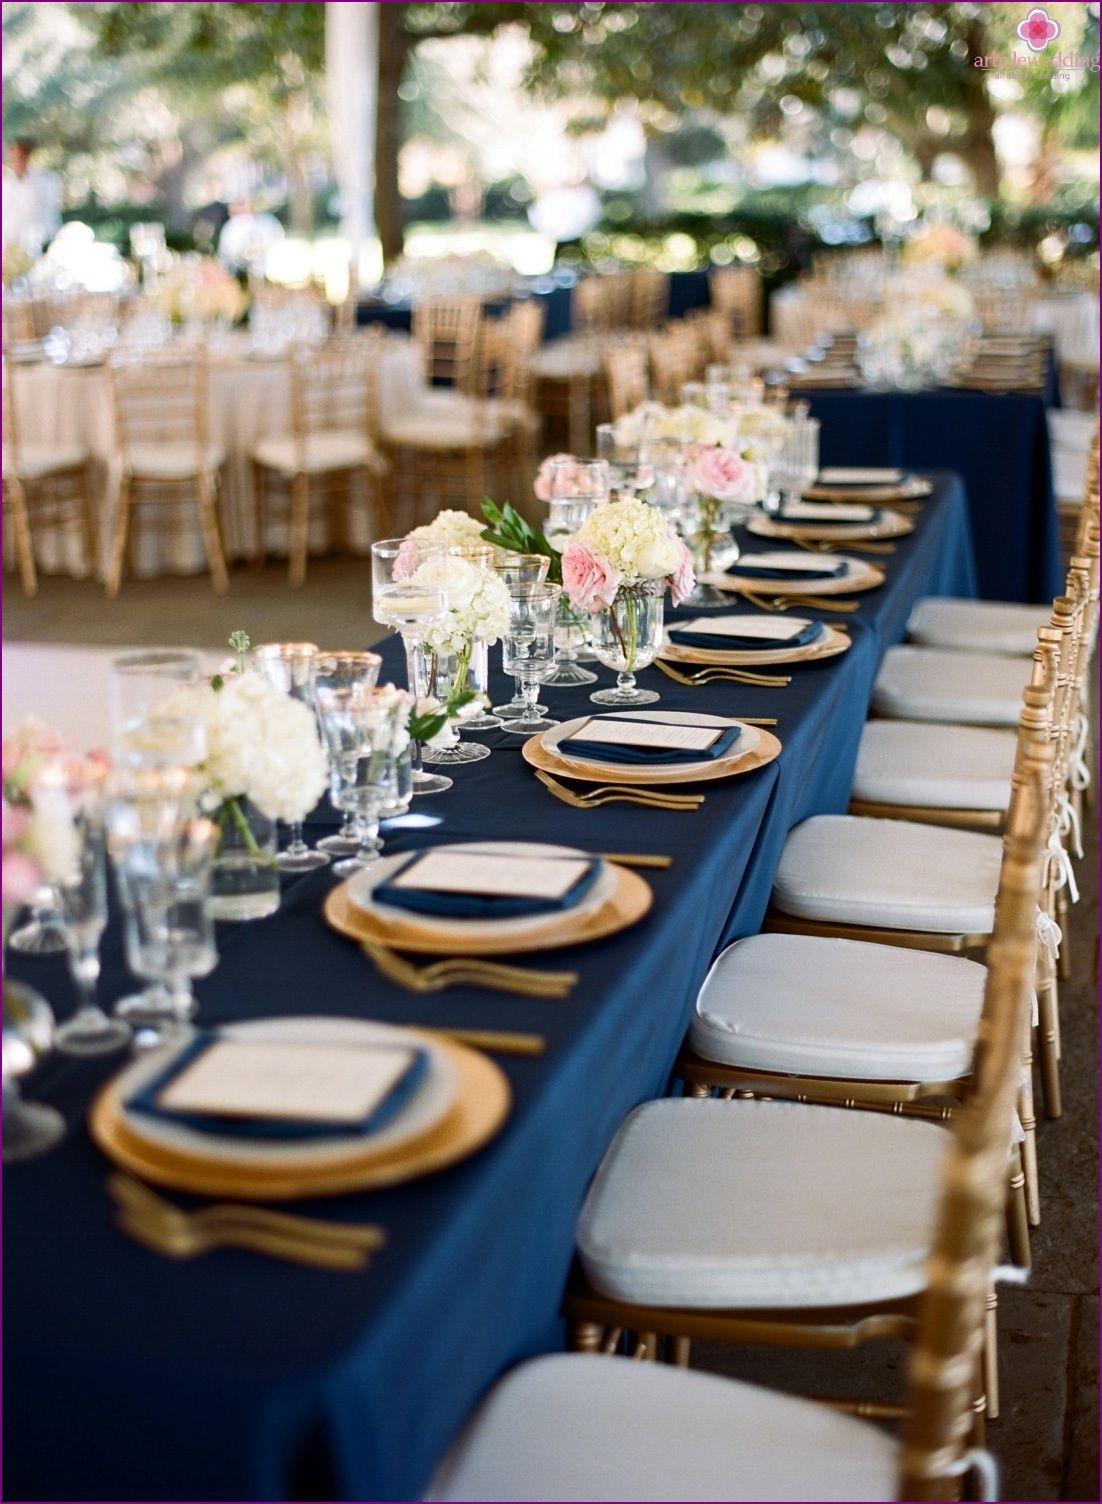 Mariage Dans Des Couleurs Bleu Et Or De Luxe Et De L Aristocratie Goldhochzeitsfarben Hochzeit Gedecke Hochzeit